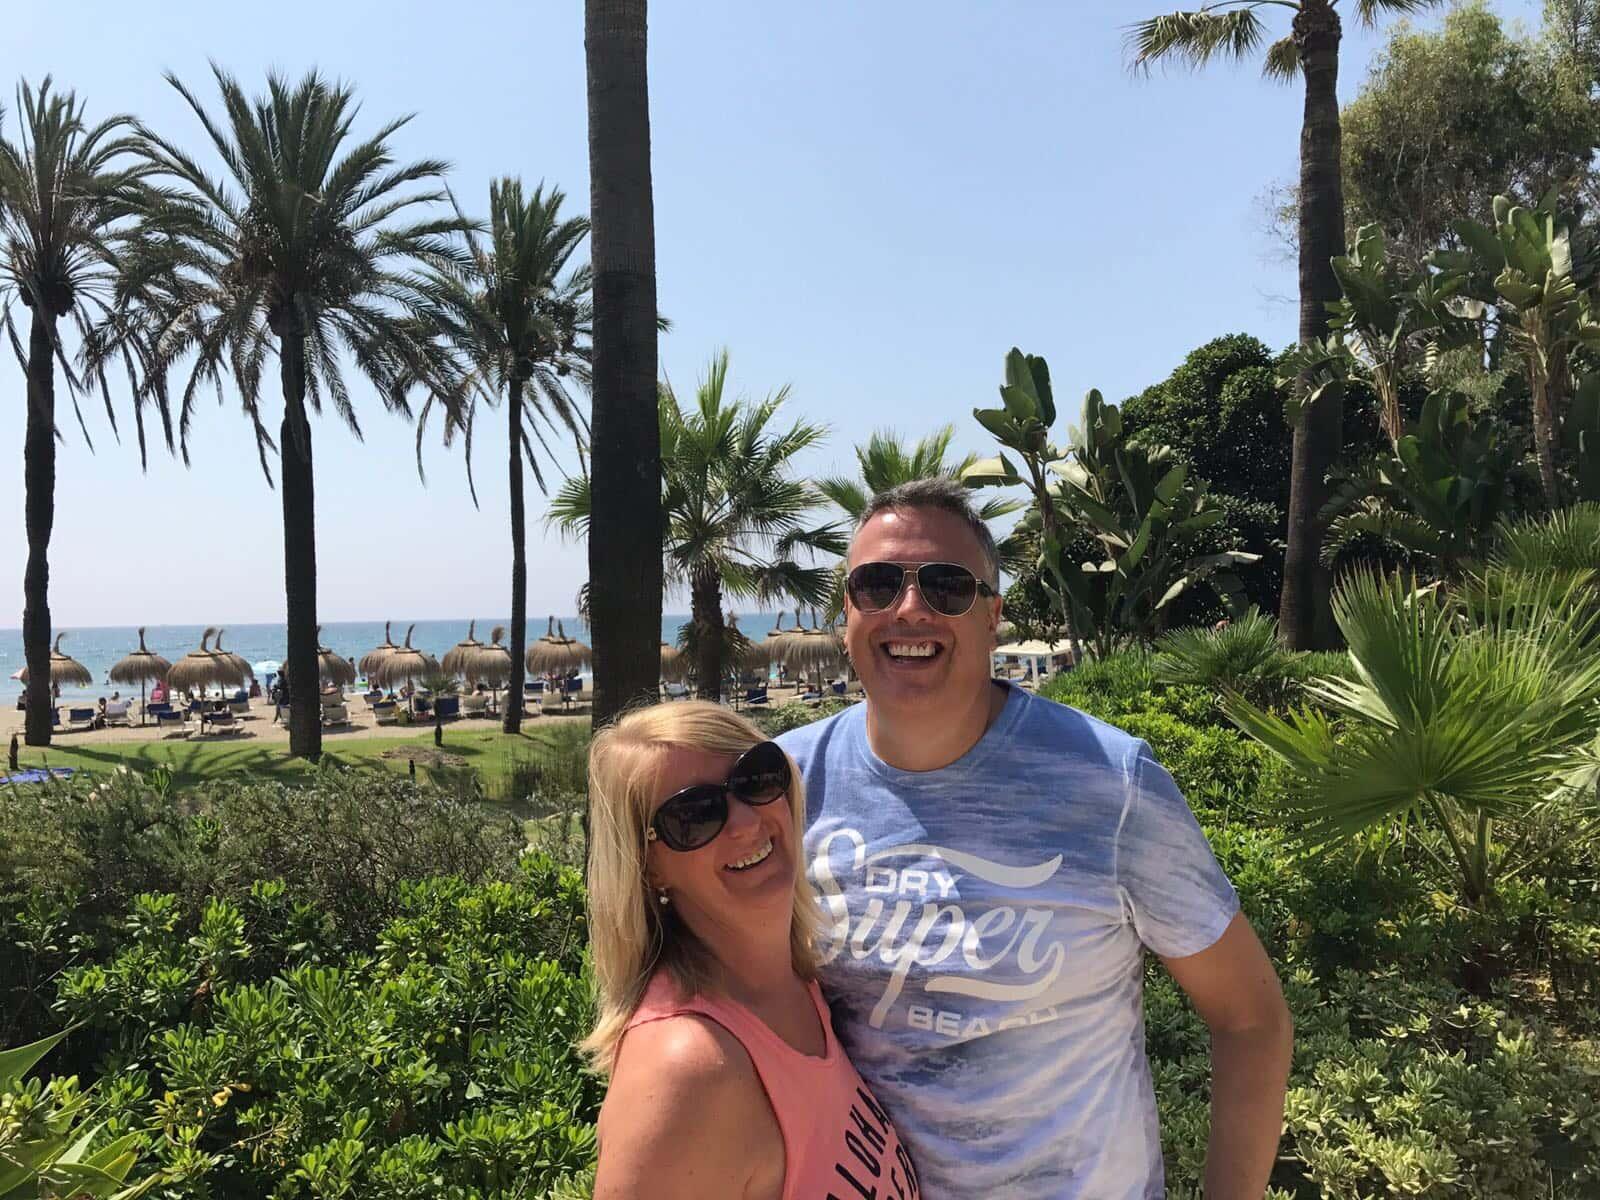 Denise & Derren from Andover, United Kingdom